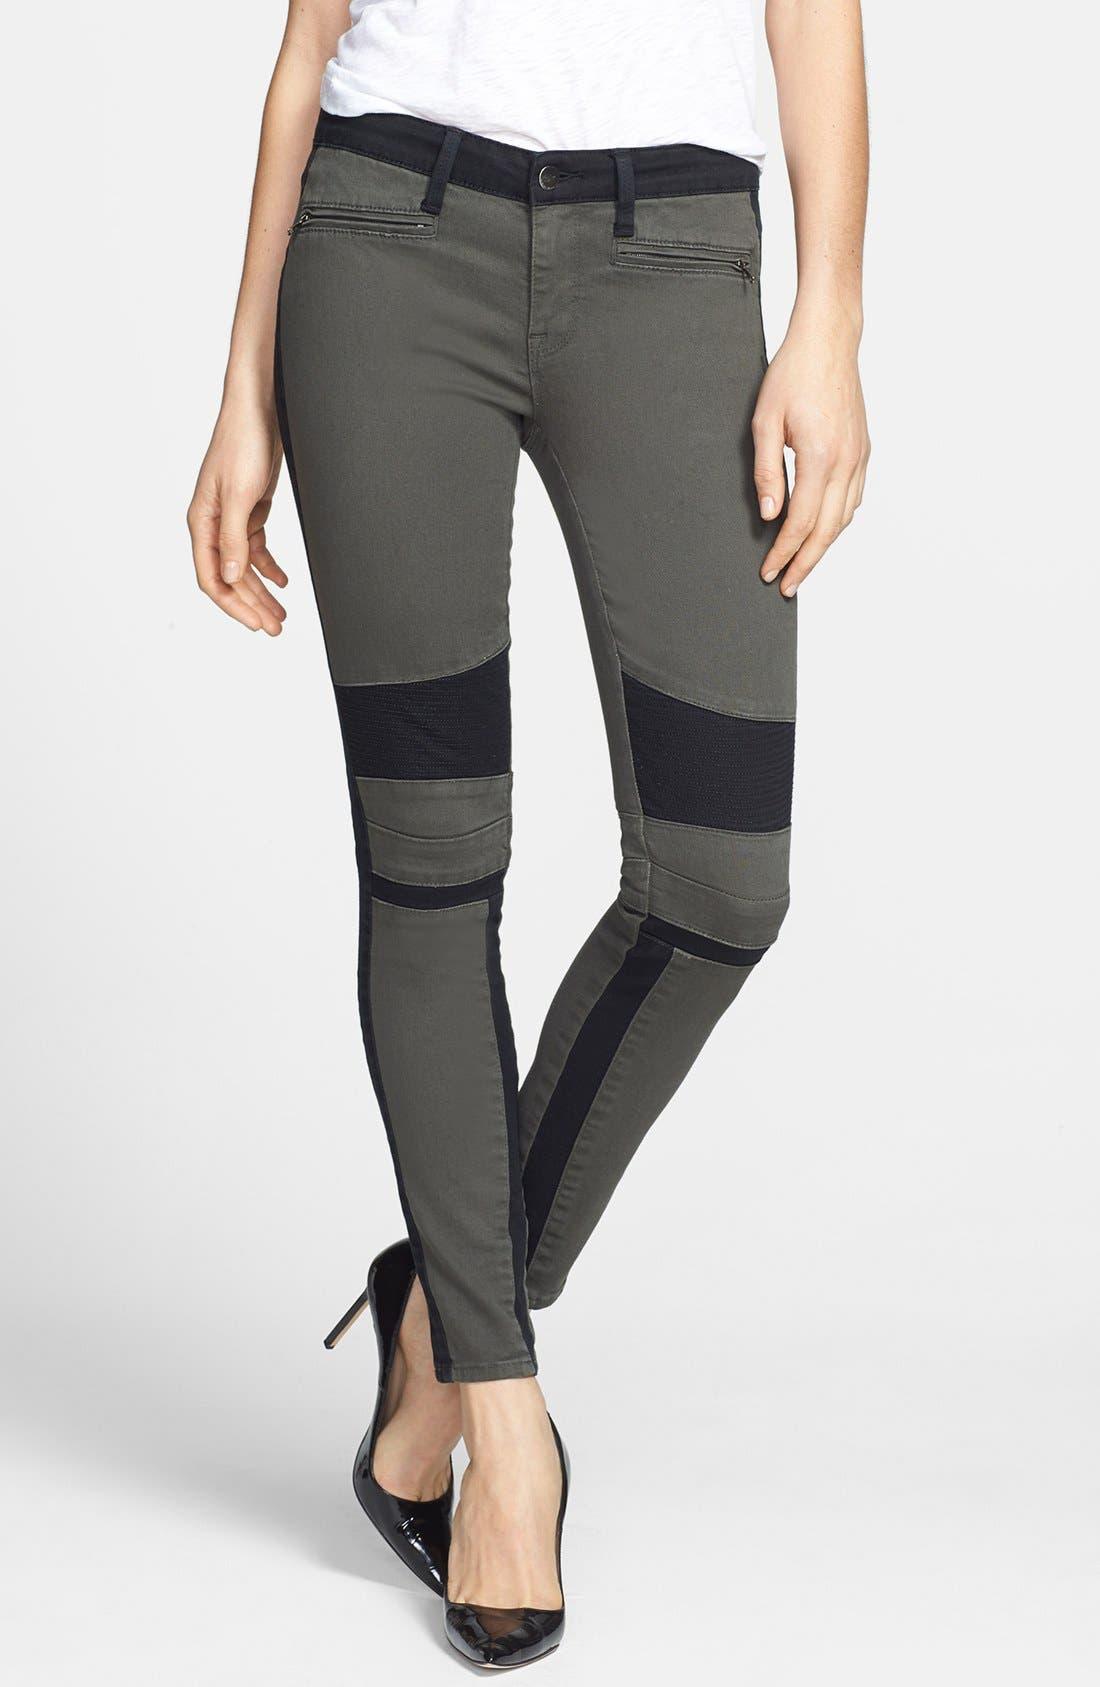 Main Image - Genetic 'Sadie' Two-Tone Moto Skinny Jeans (Chrome)